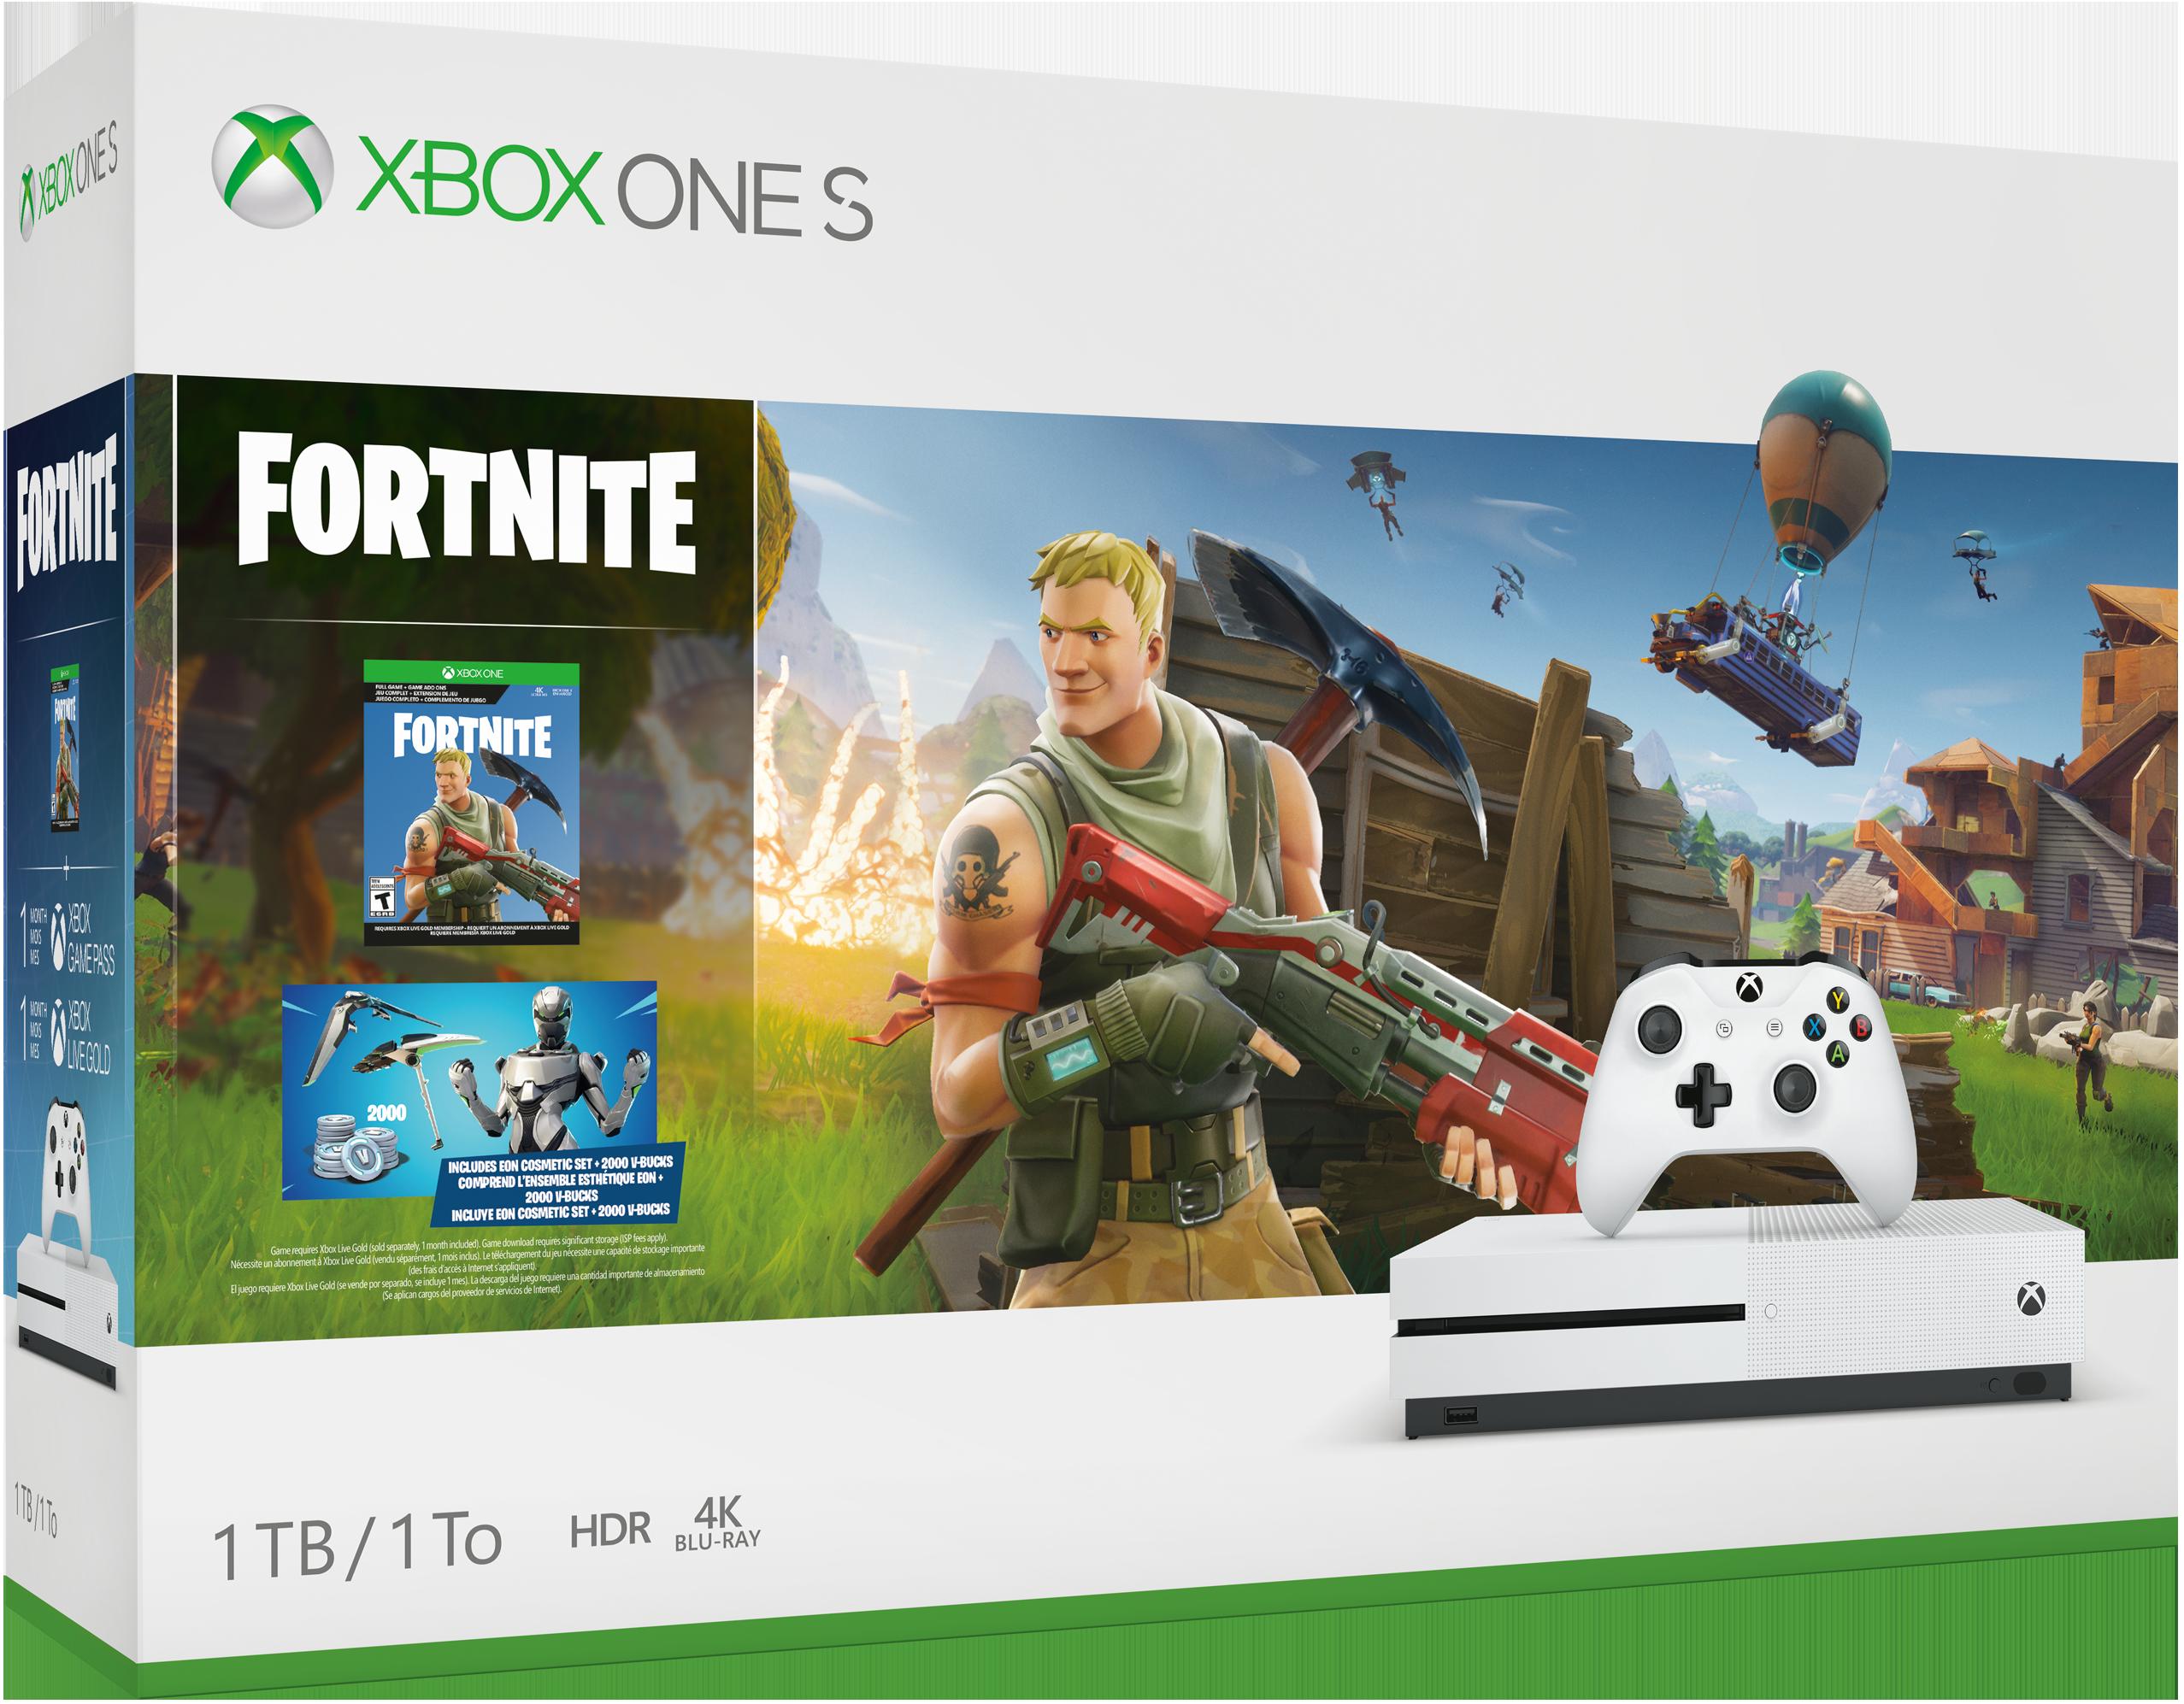 Xbox One S Fortnite Bundle box art